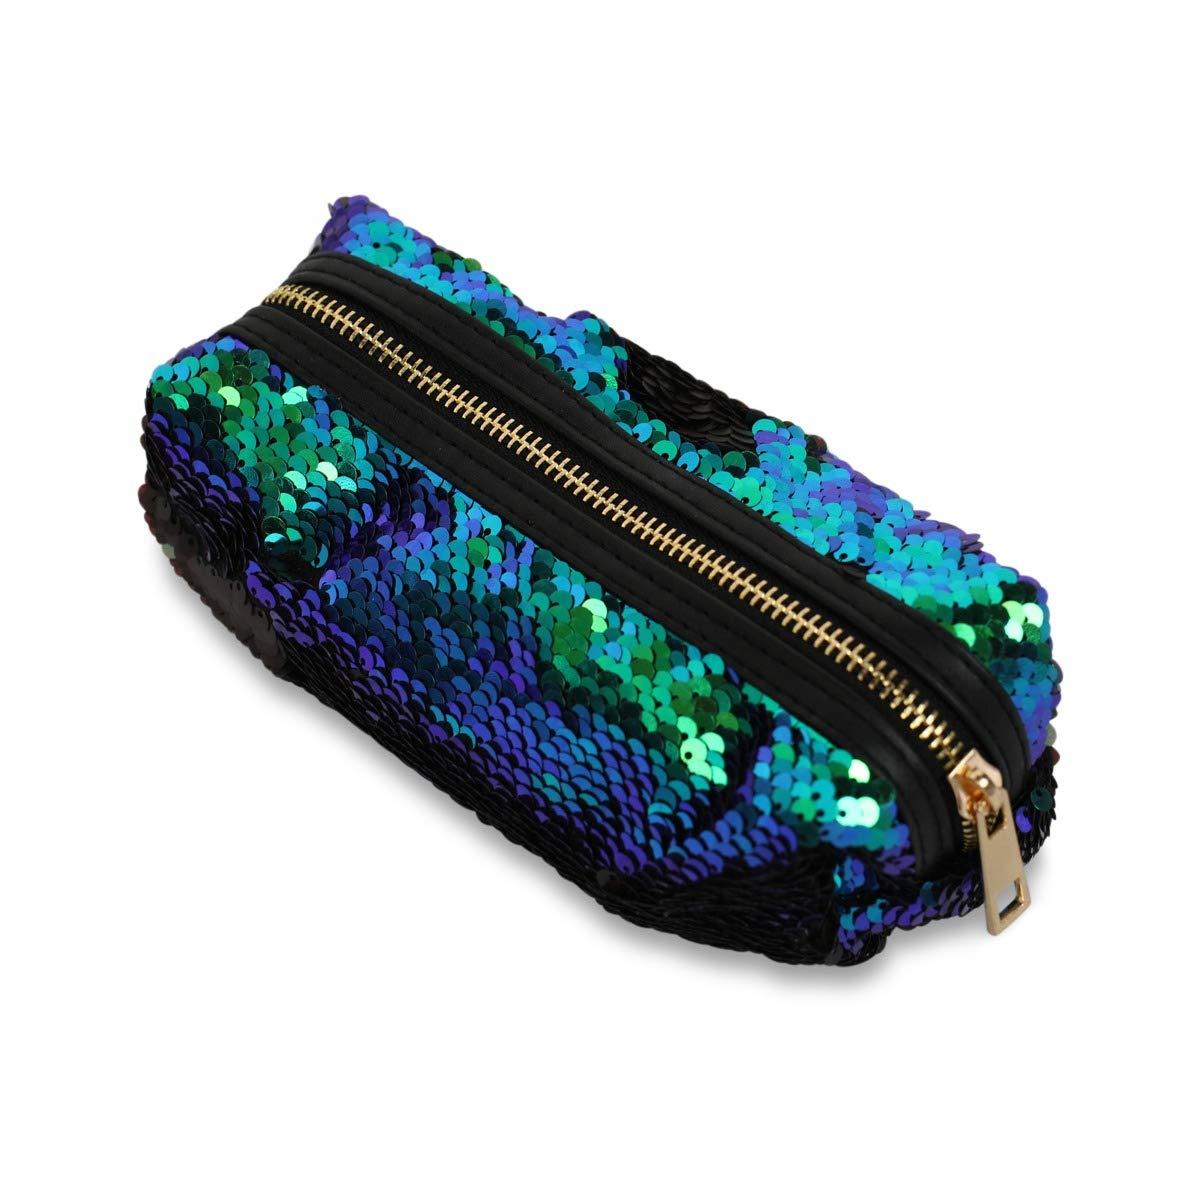 Funky Monkey Fashion Makeup Cosmetic Bag | Students Pencil Case Glitter | Reversible Mermaid Sequin Kids Pouch Women Fashion Handbag - Muti - Color